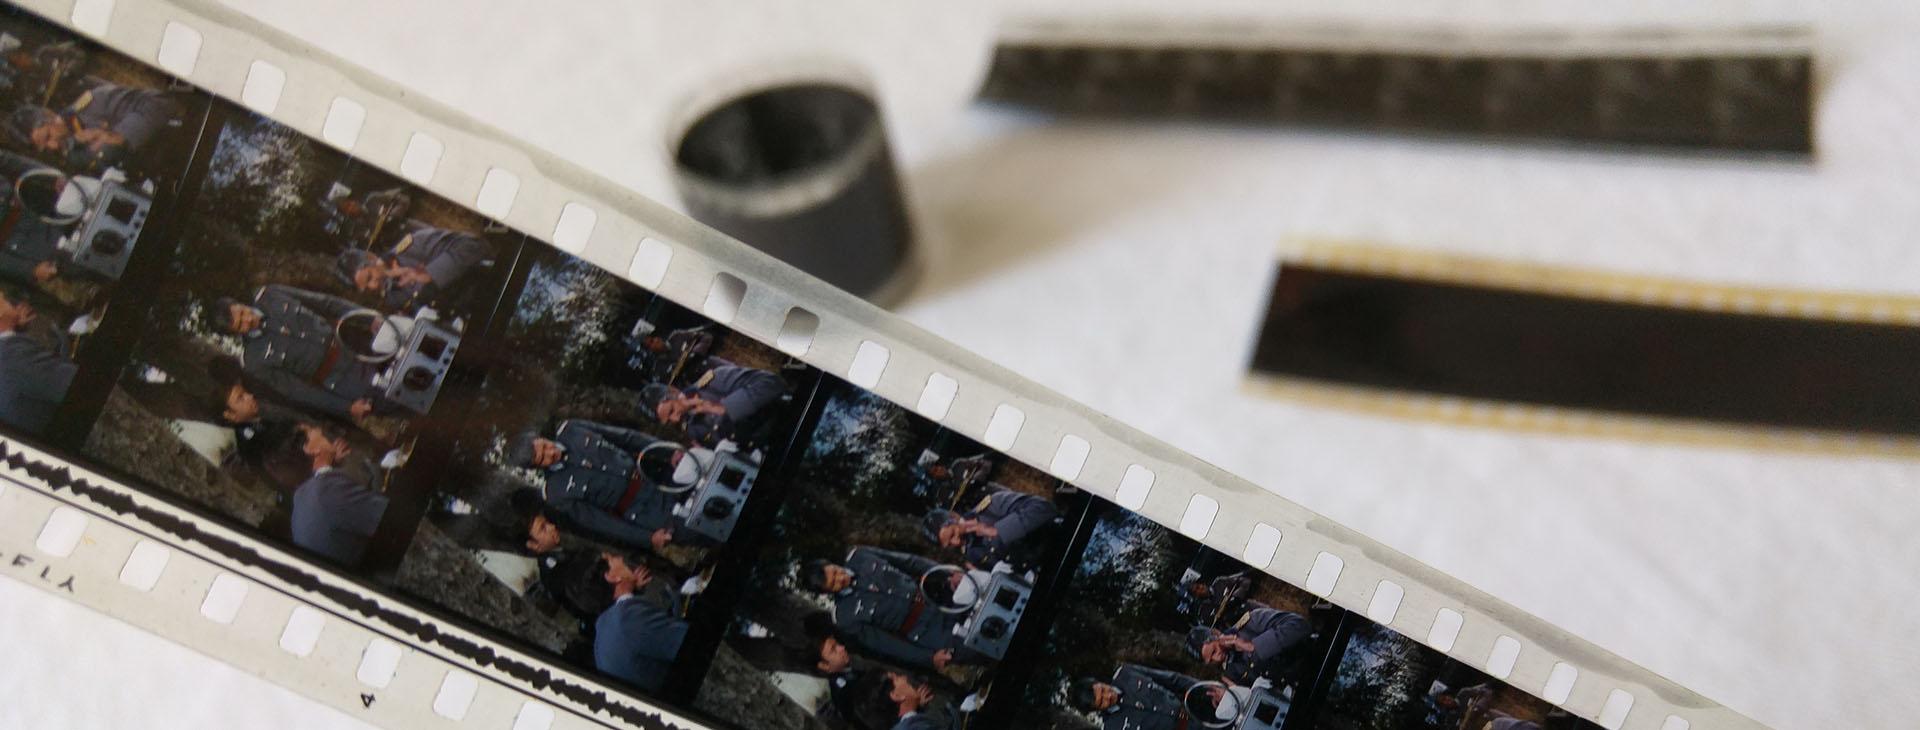 various film